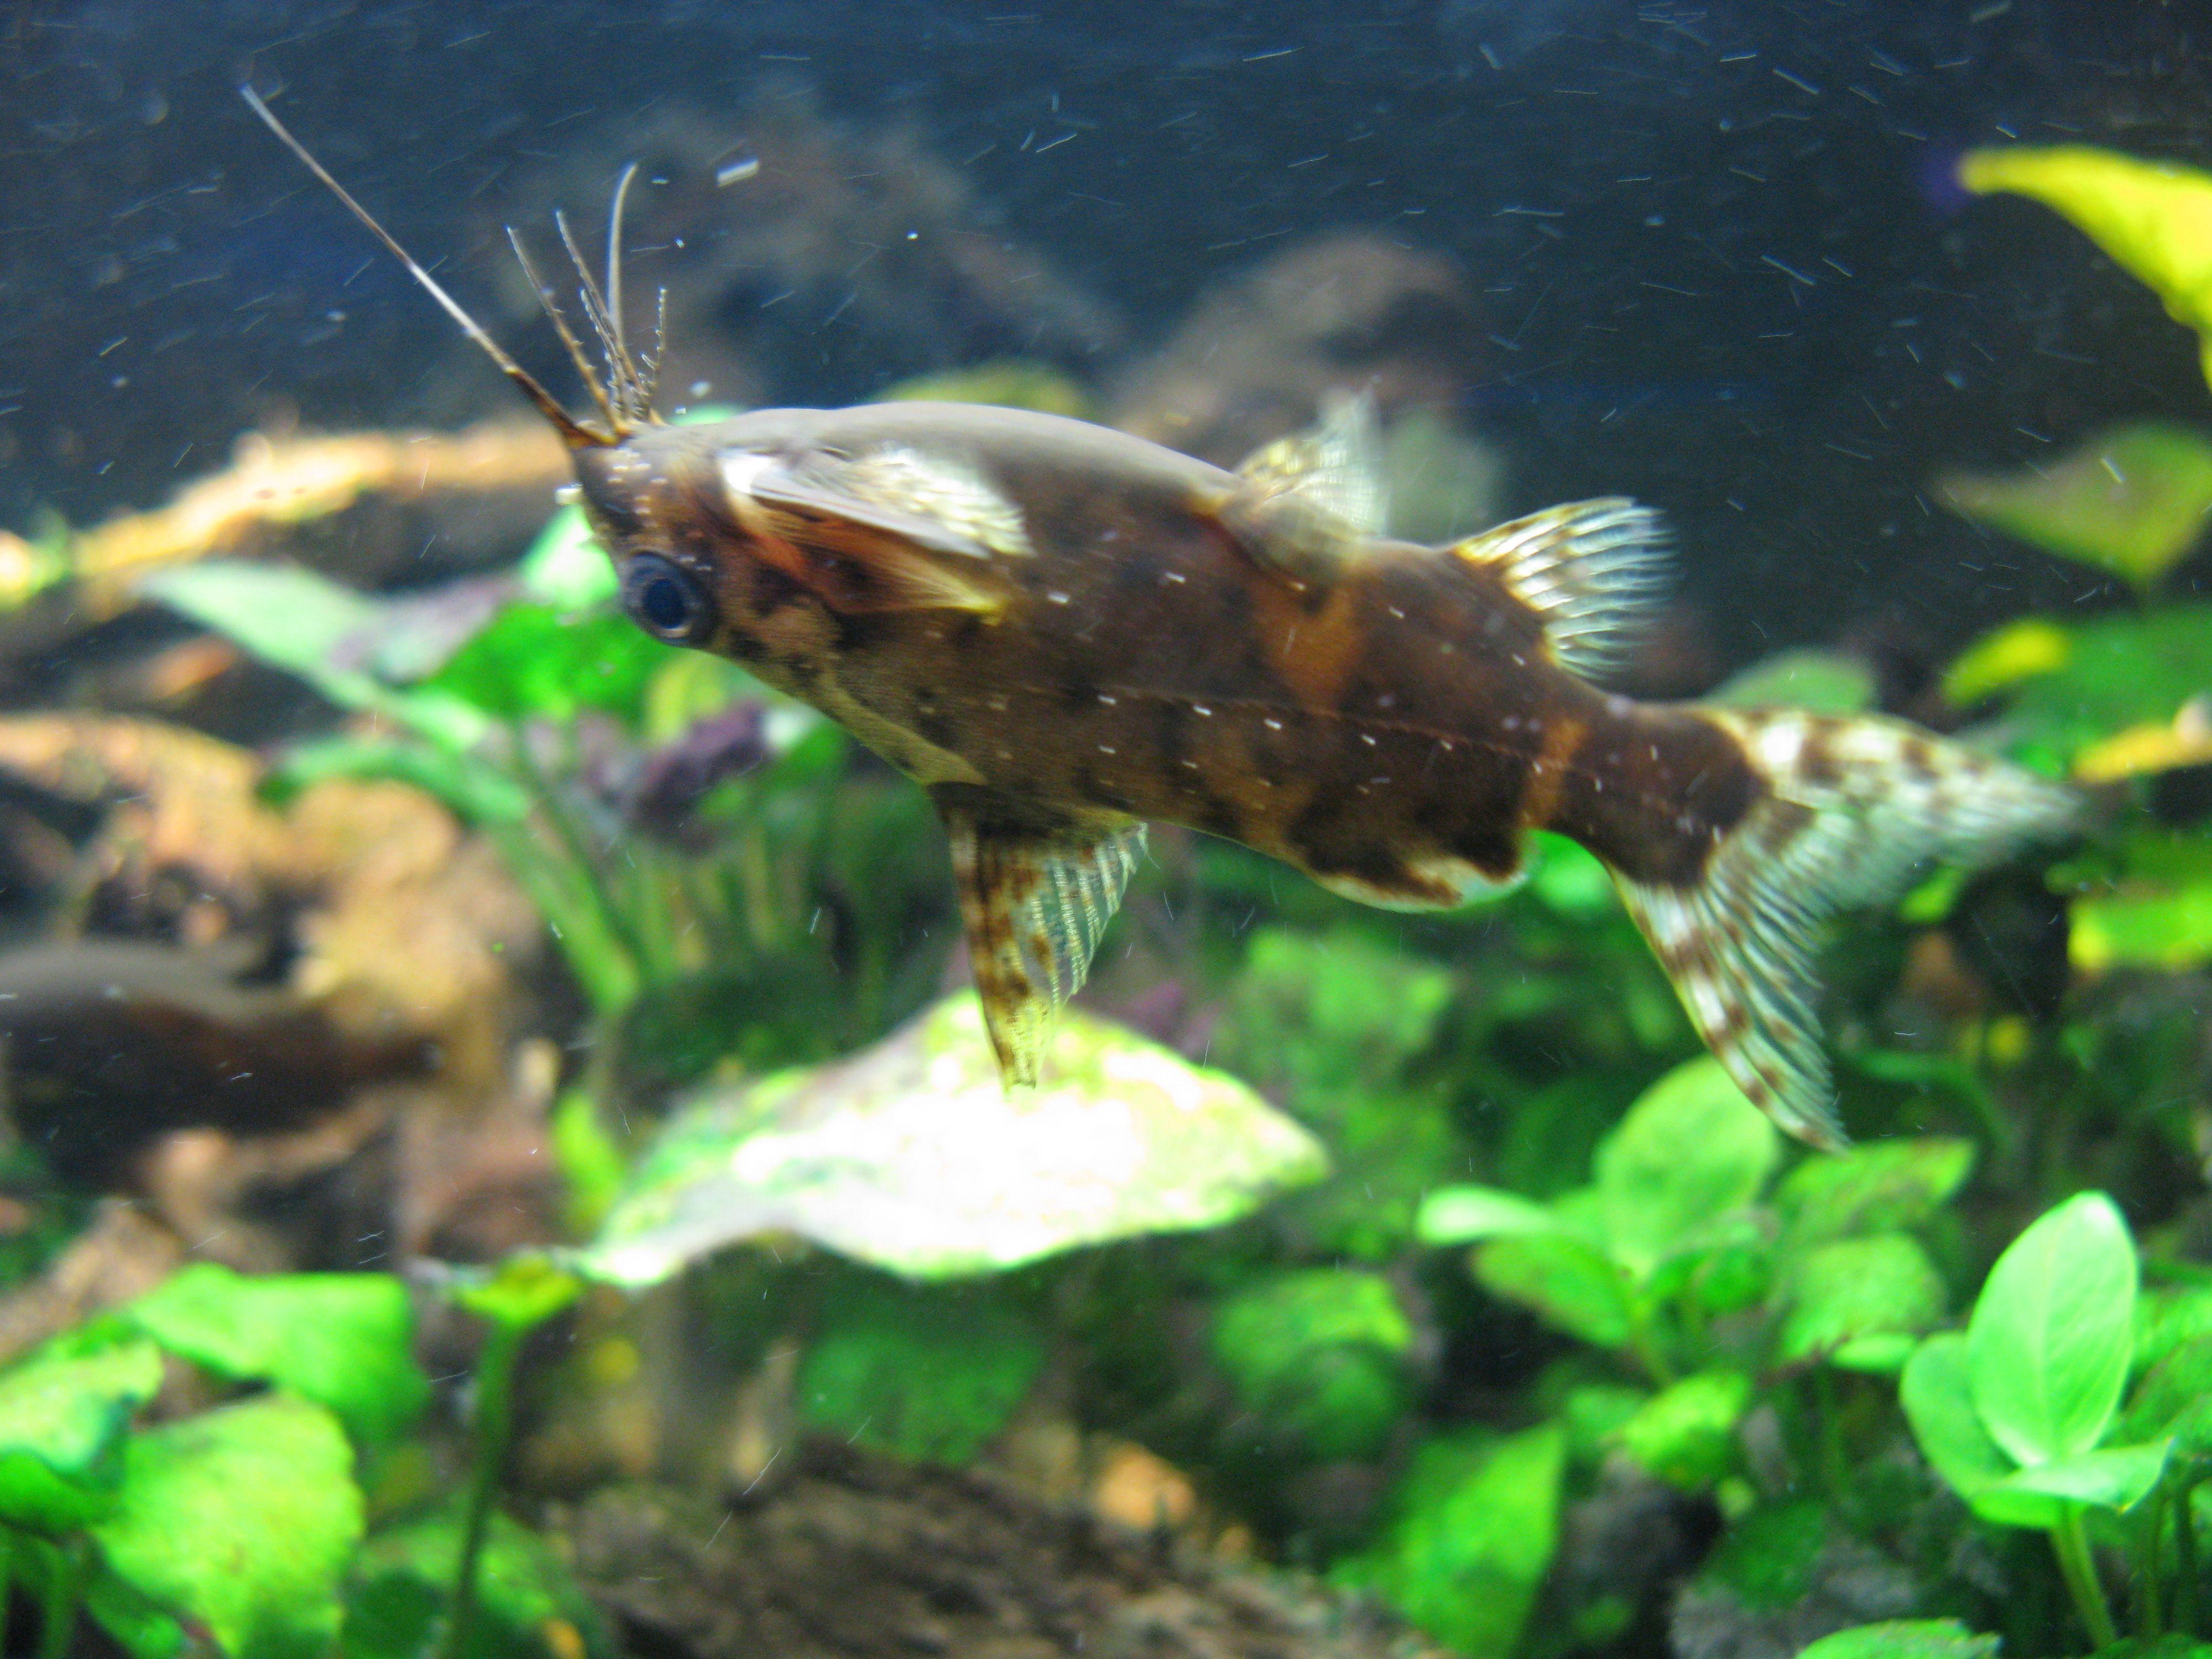 Pin By Sarah Hammell On Fish I Want Upside Down Catfish Catfish Fish Pet